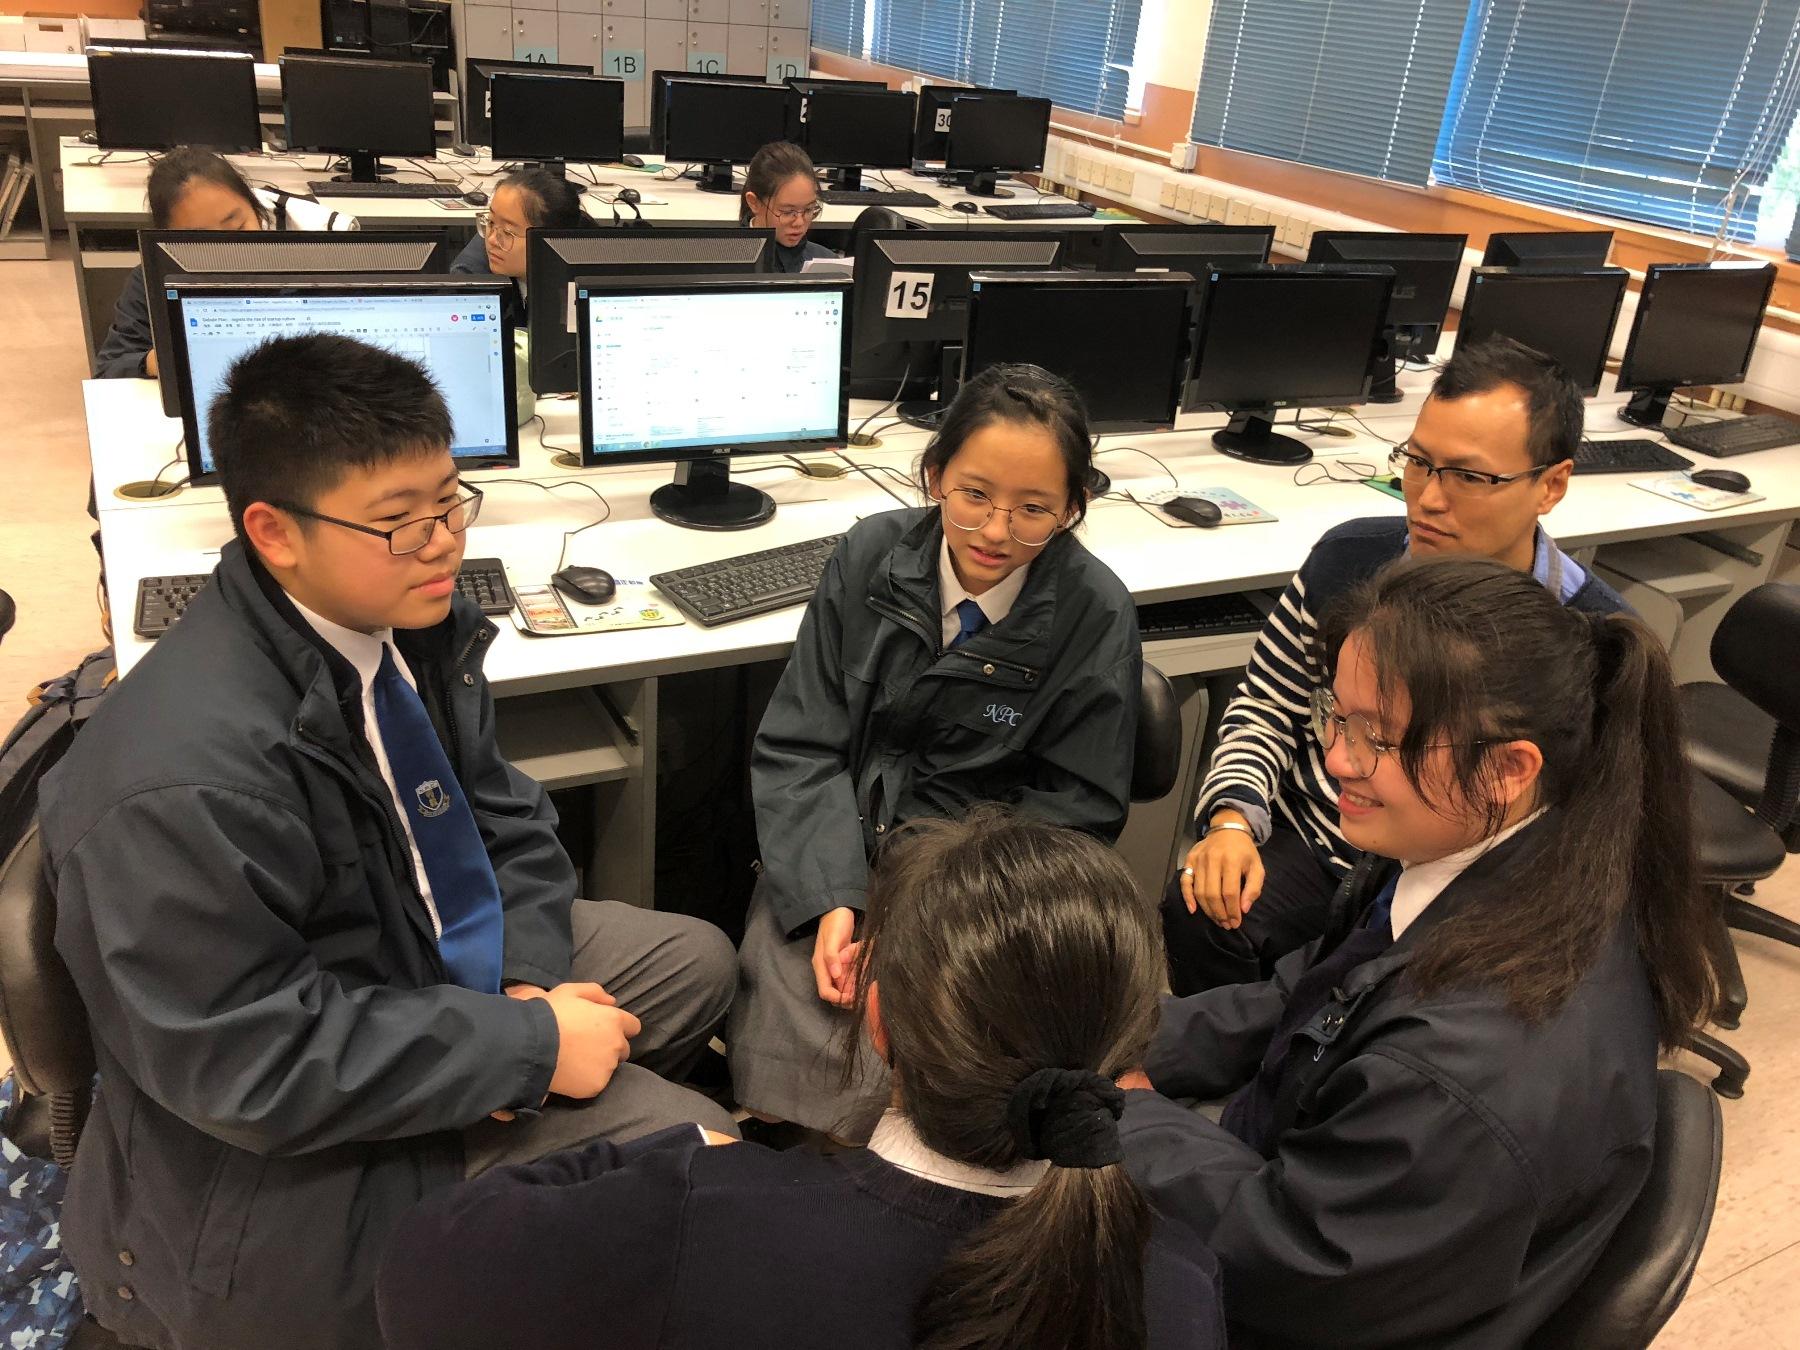 http://npc.edu.hk/sites/default/files/img_4967.jpg